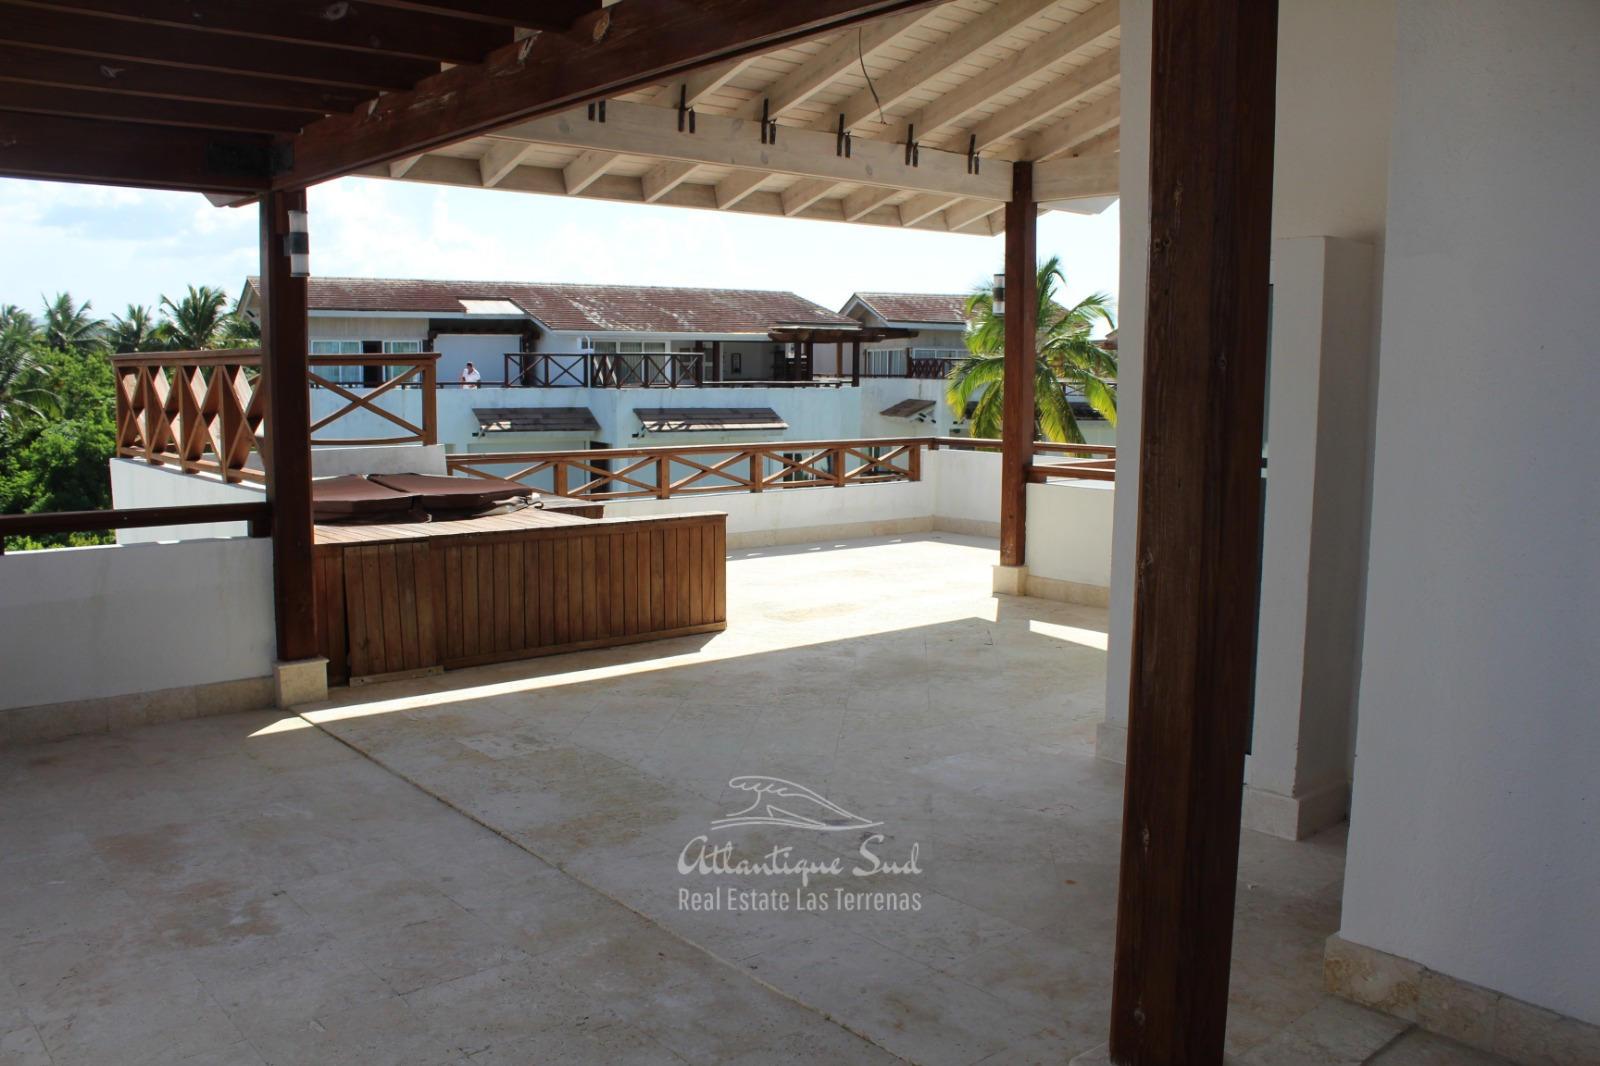 Apartments near the beach real estate las terrenas dominican republic45.jpg